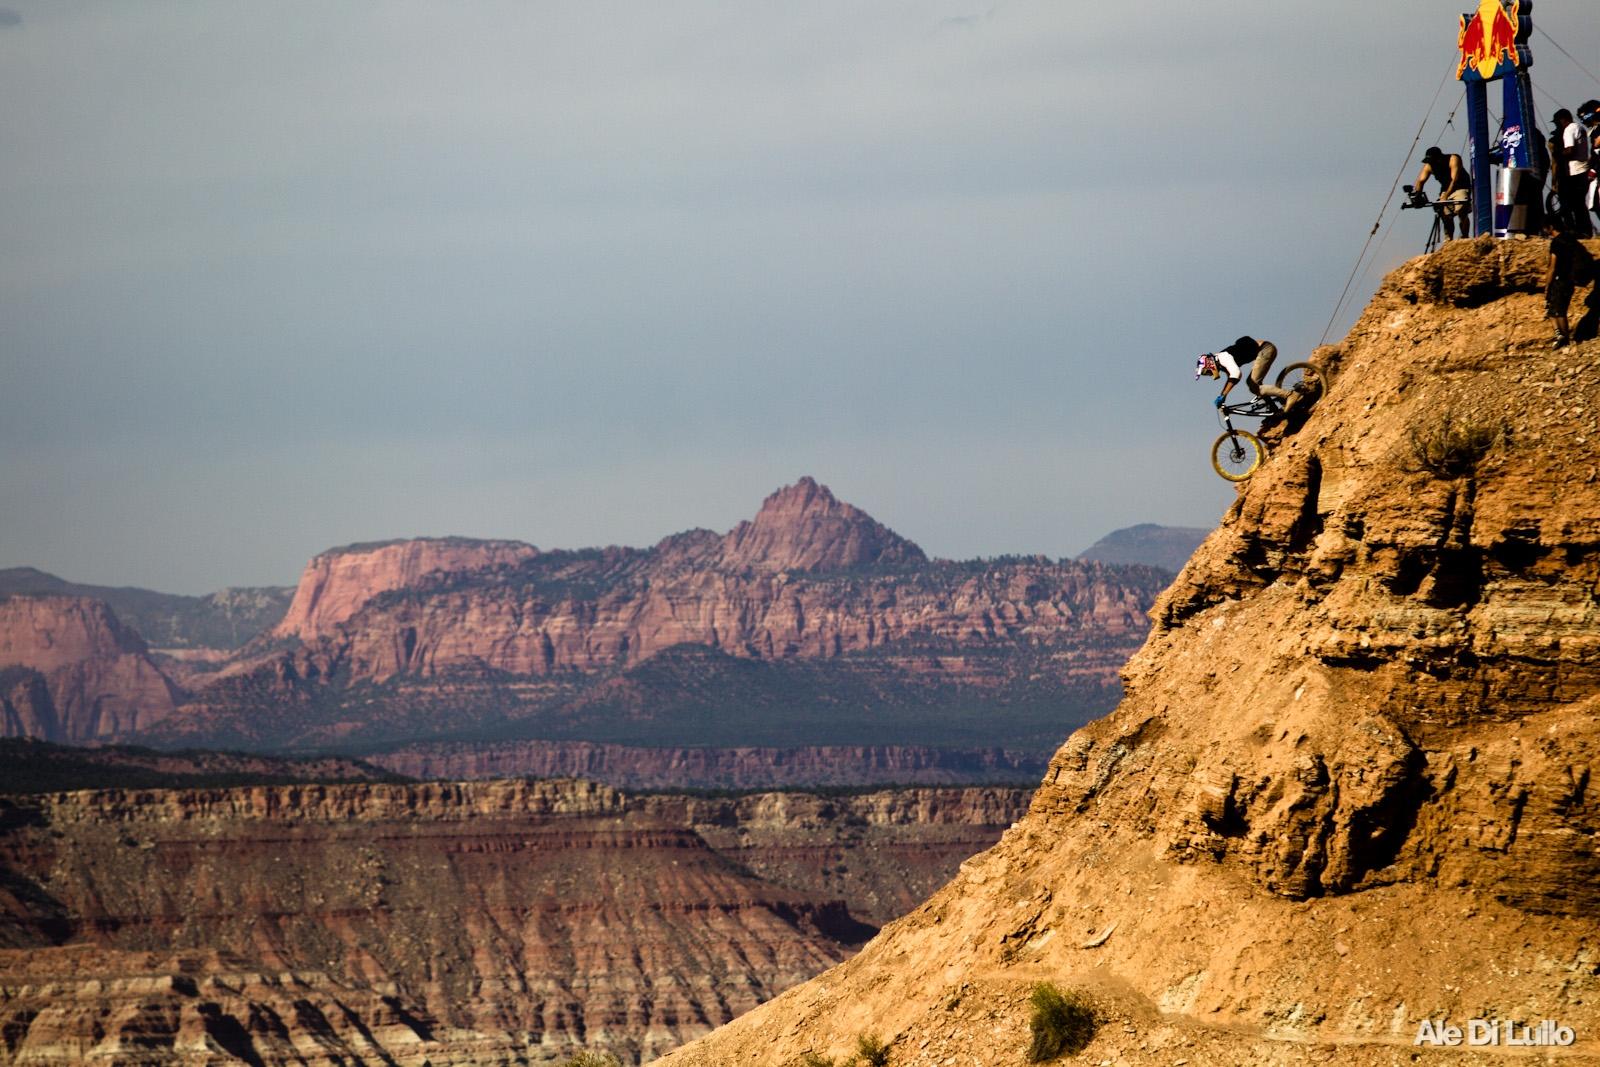 RB_RAMPAGE_Martin Soederstrom_Utah 2012_by AleDiLullo-4306